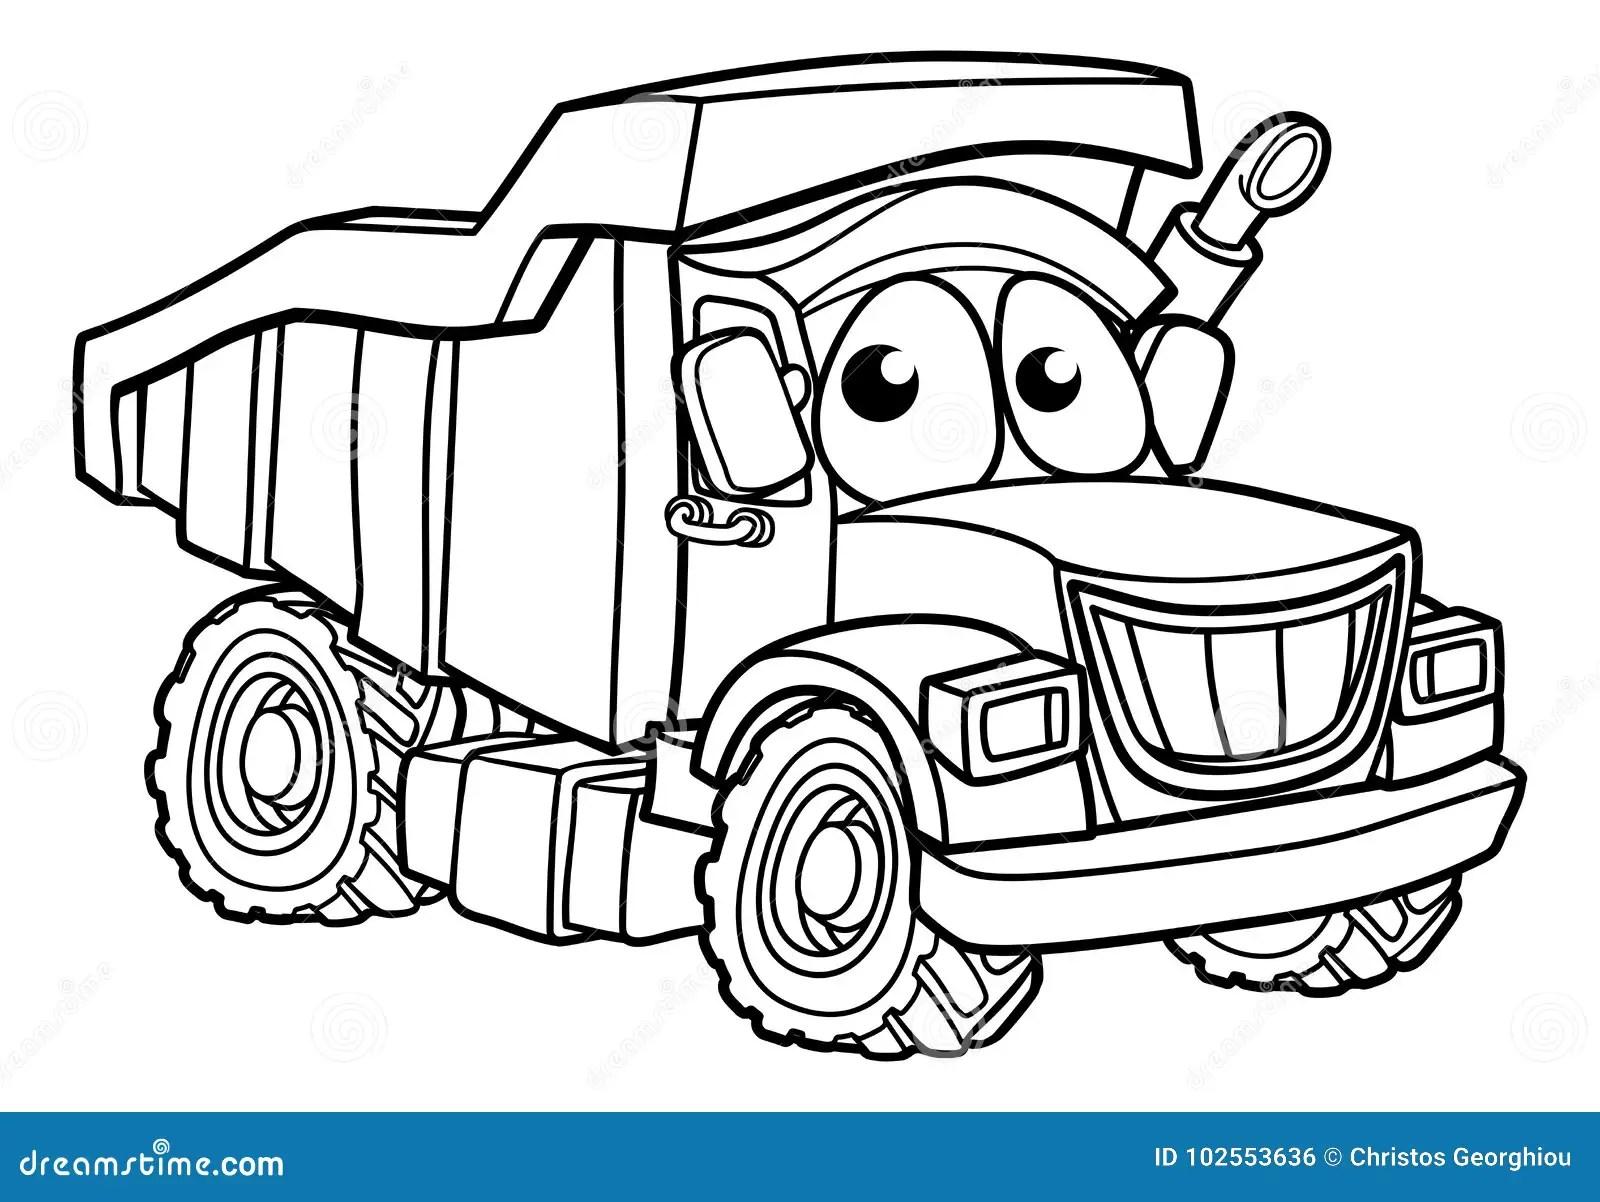 Cartoon Character Dump Truck Stock Vector